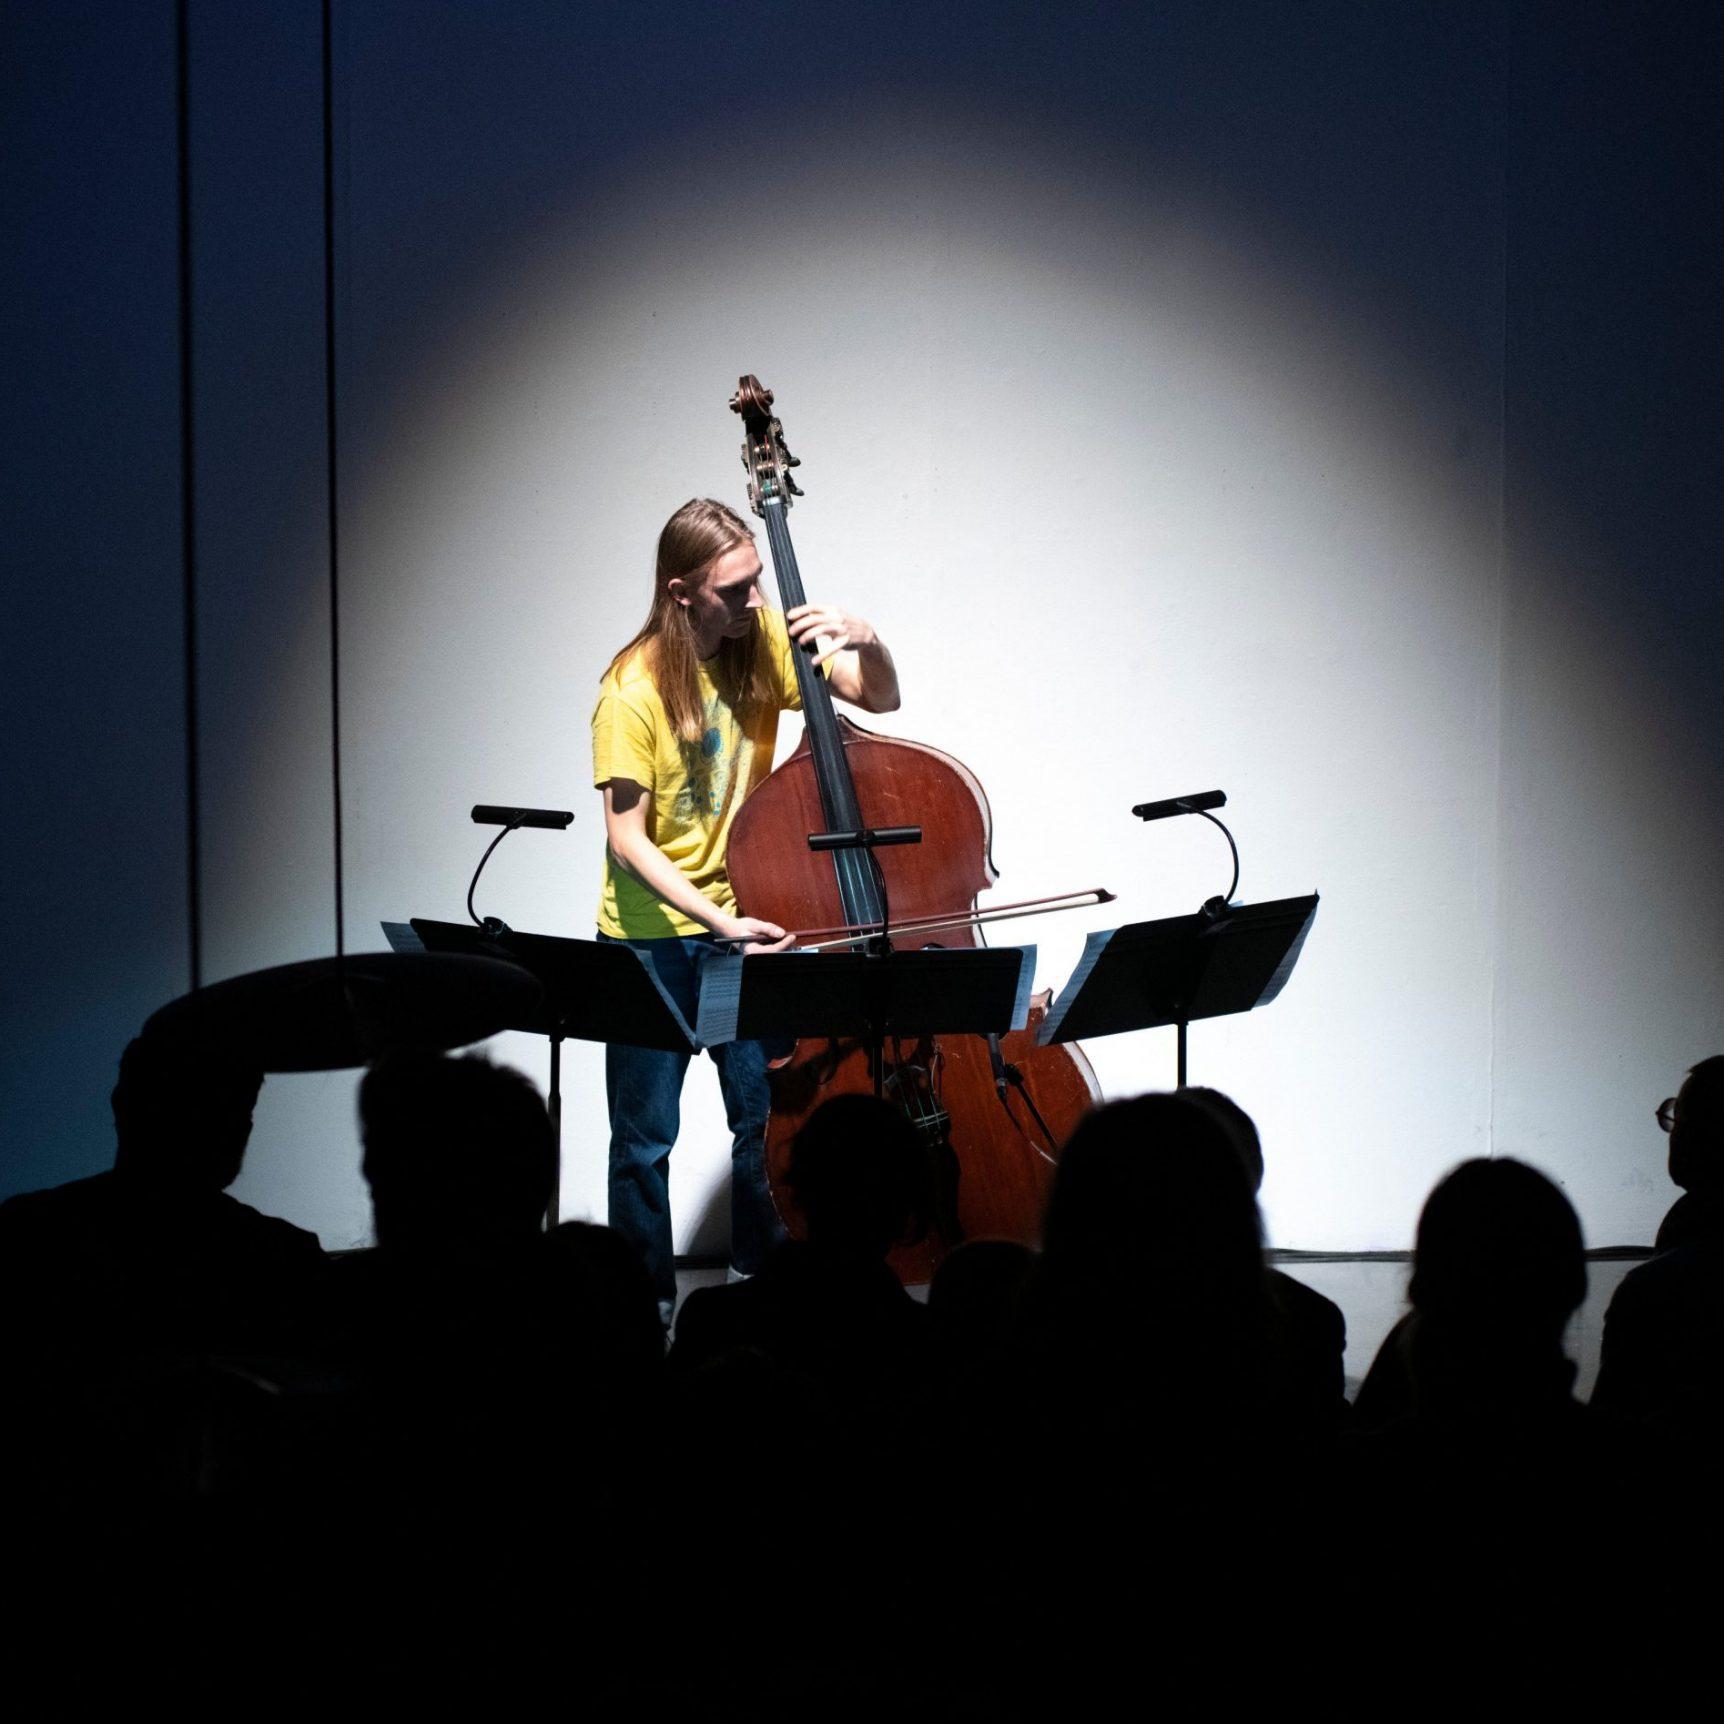 Otto playing bass under spotlight